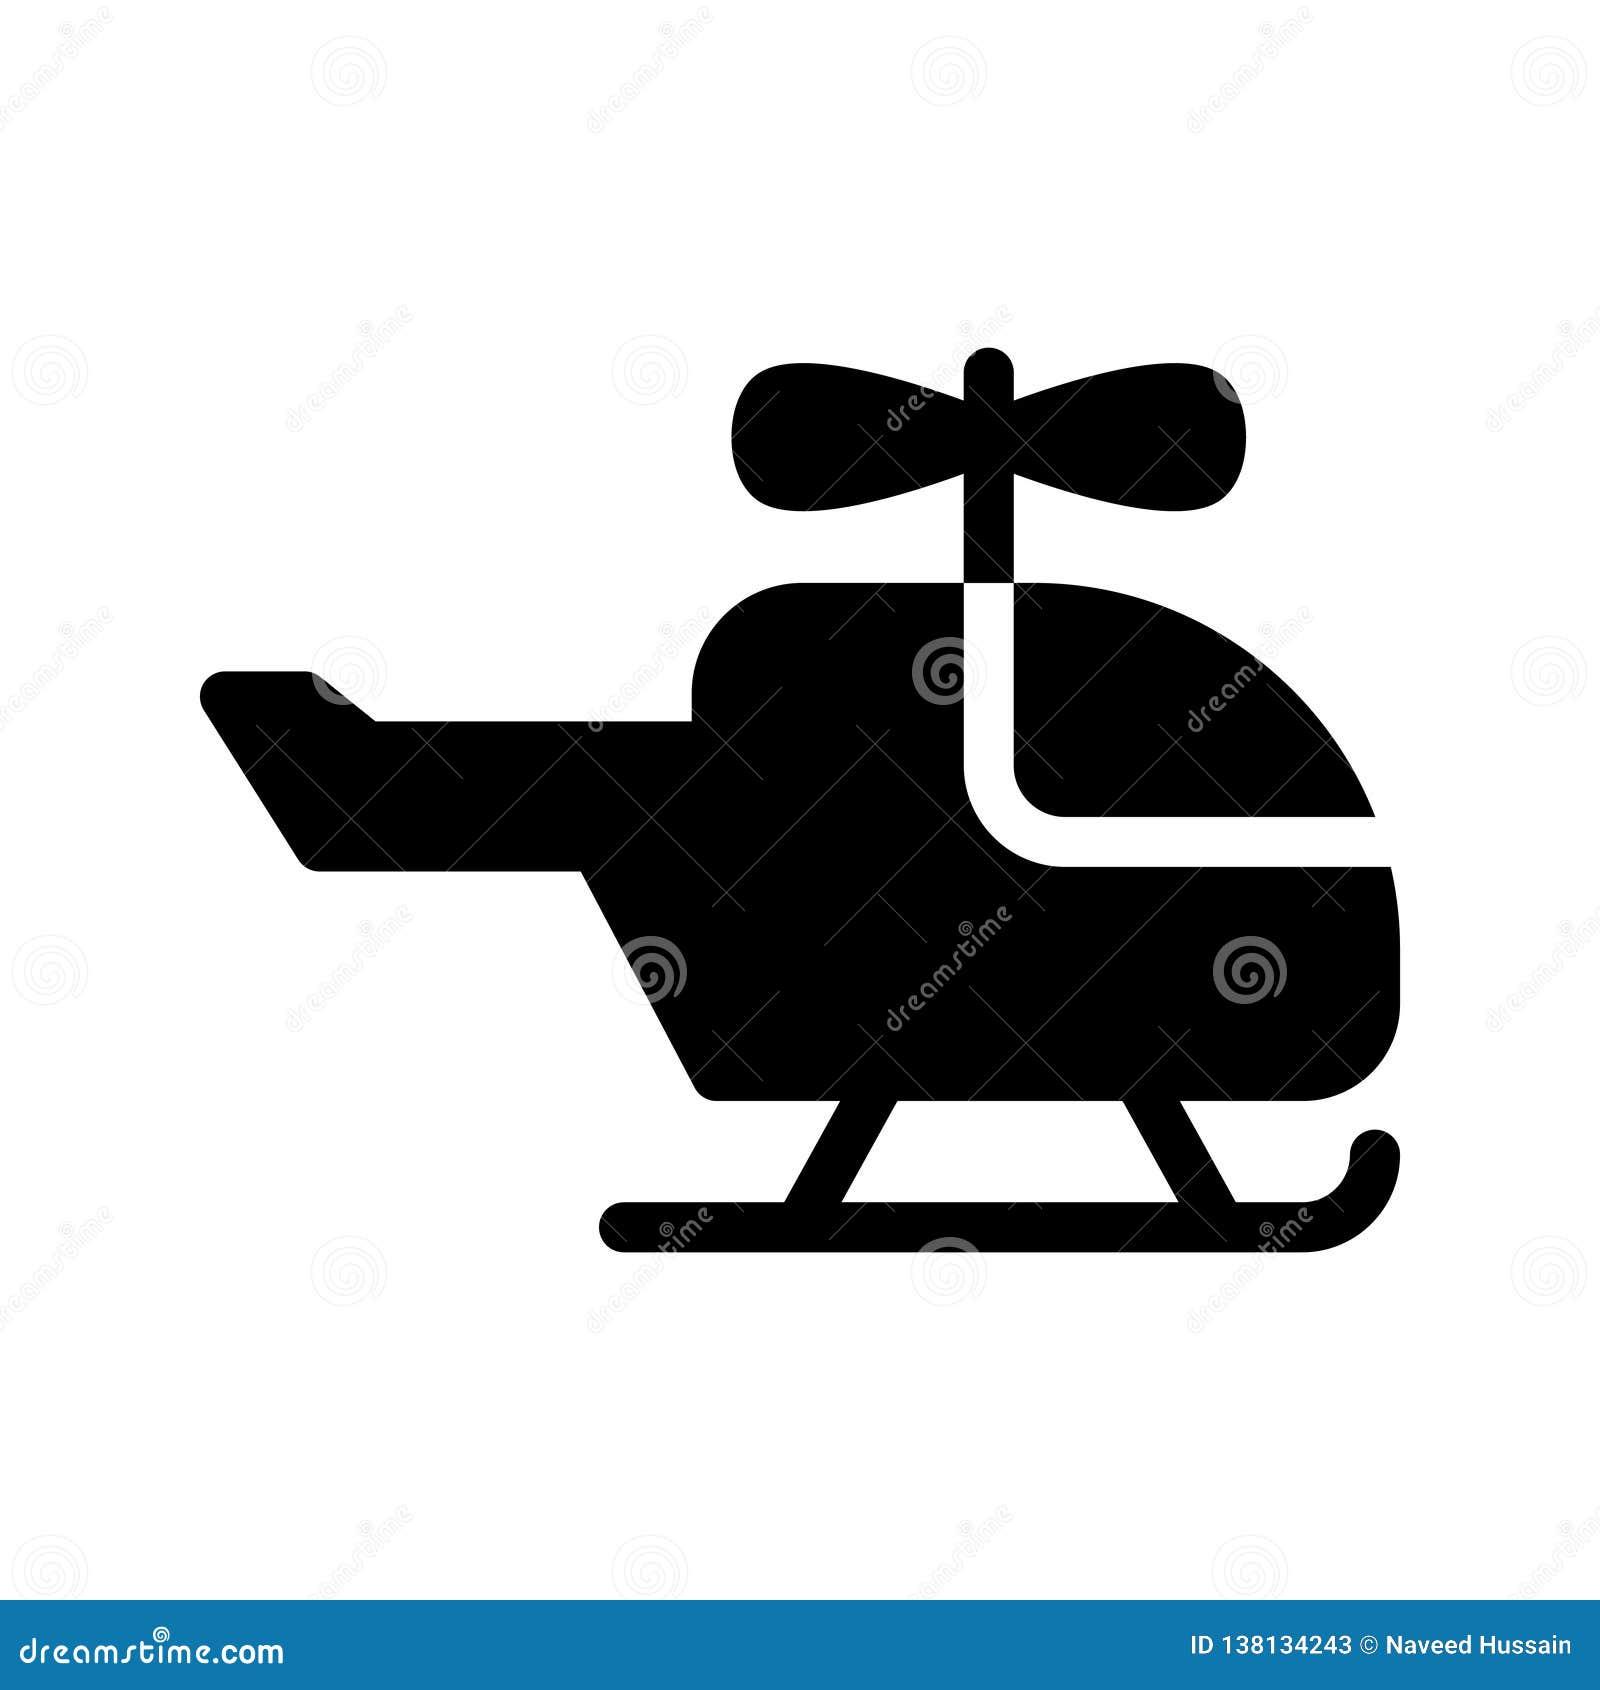 Chopper glyph vector icon